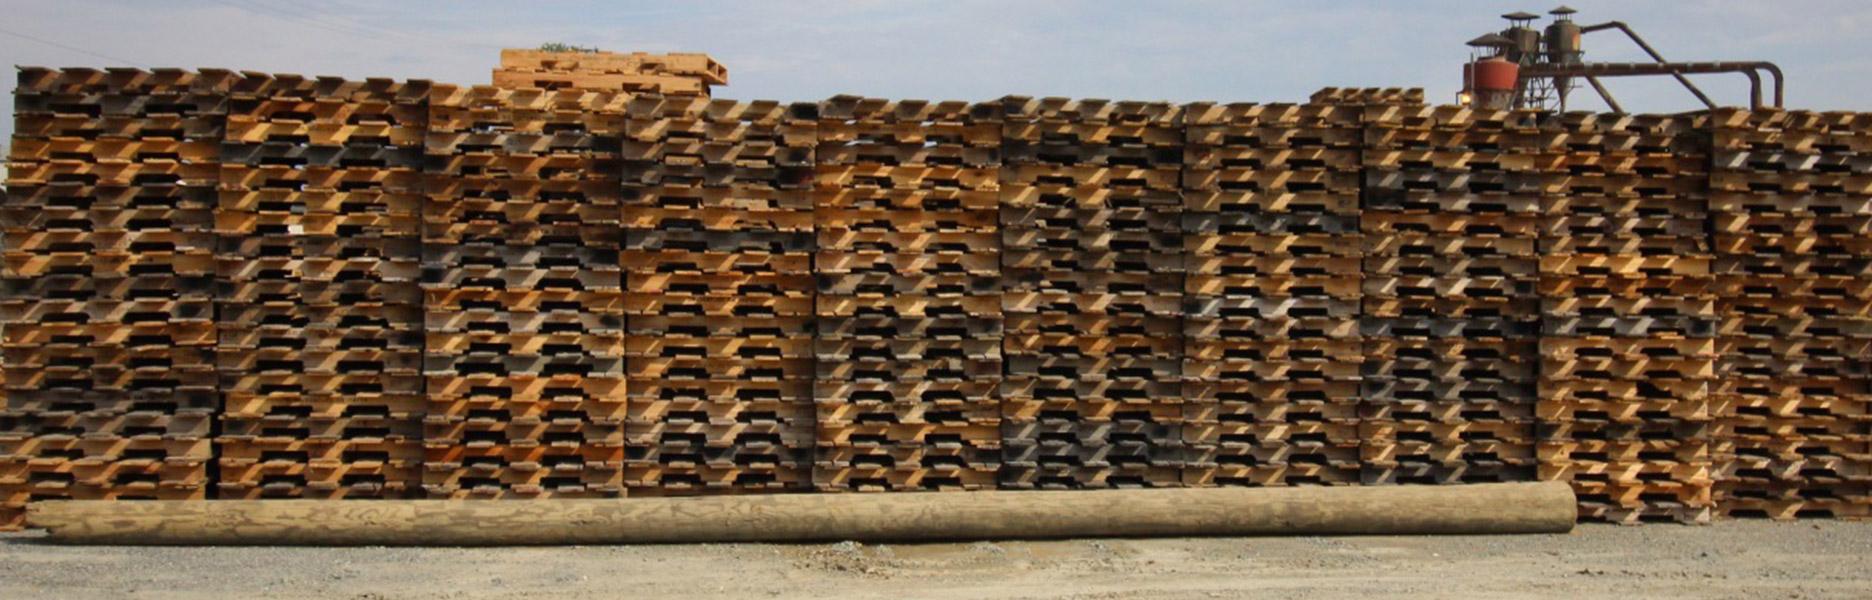 recycled wood pallets, richmond va